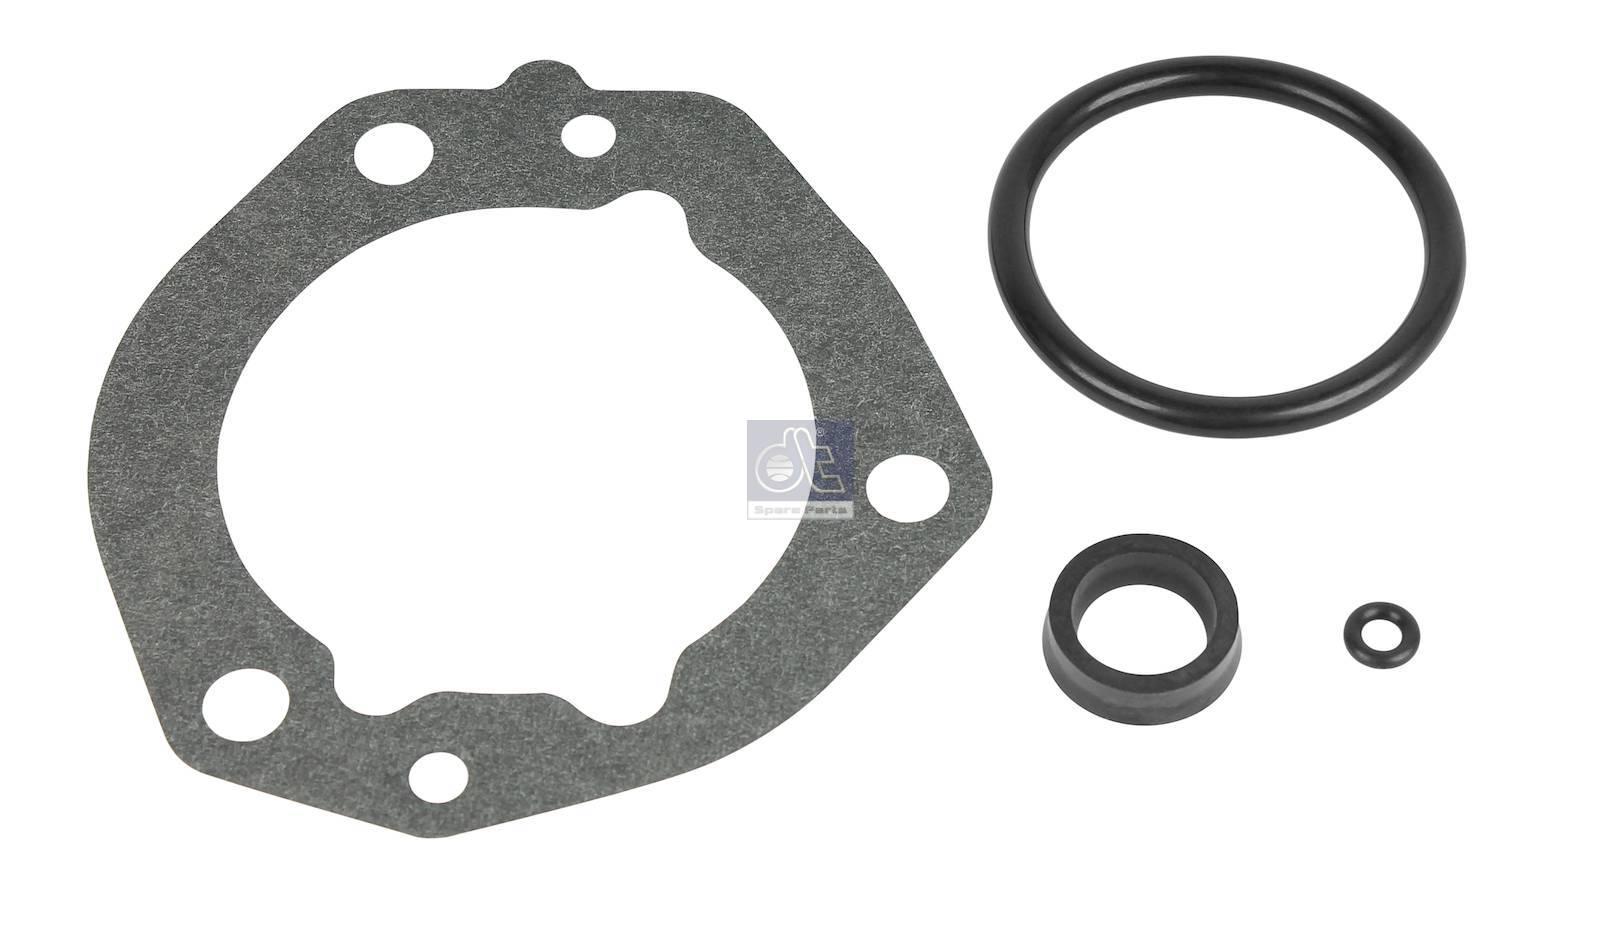 Gasket kit, differential lock